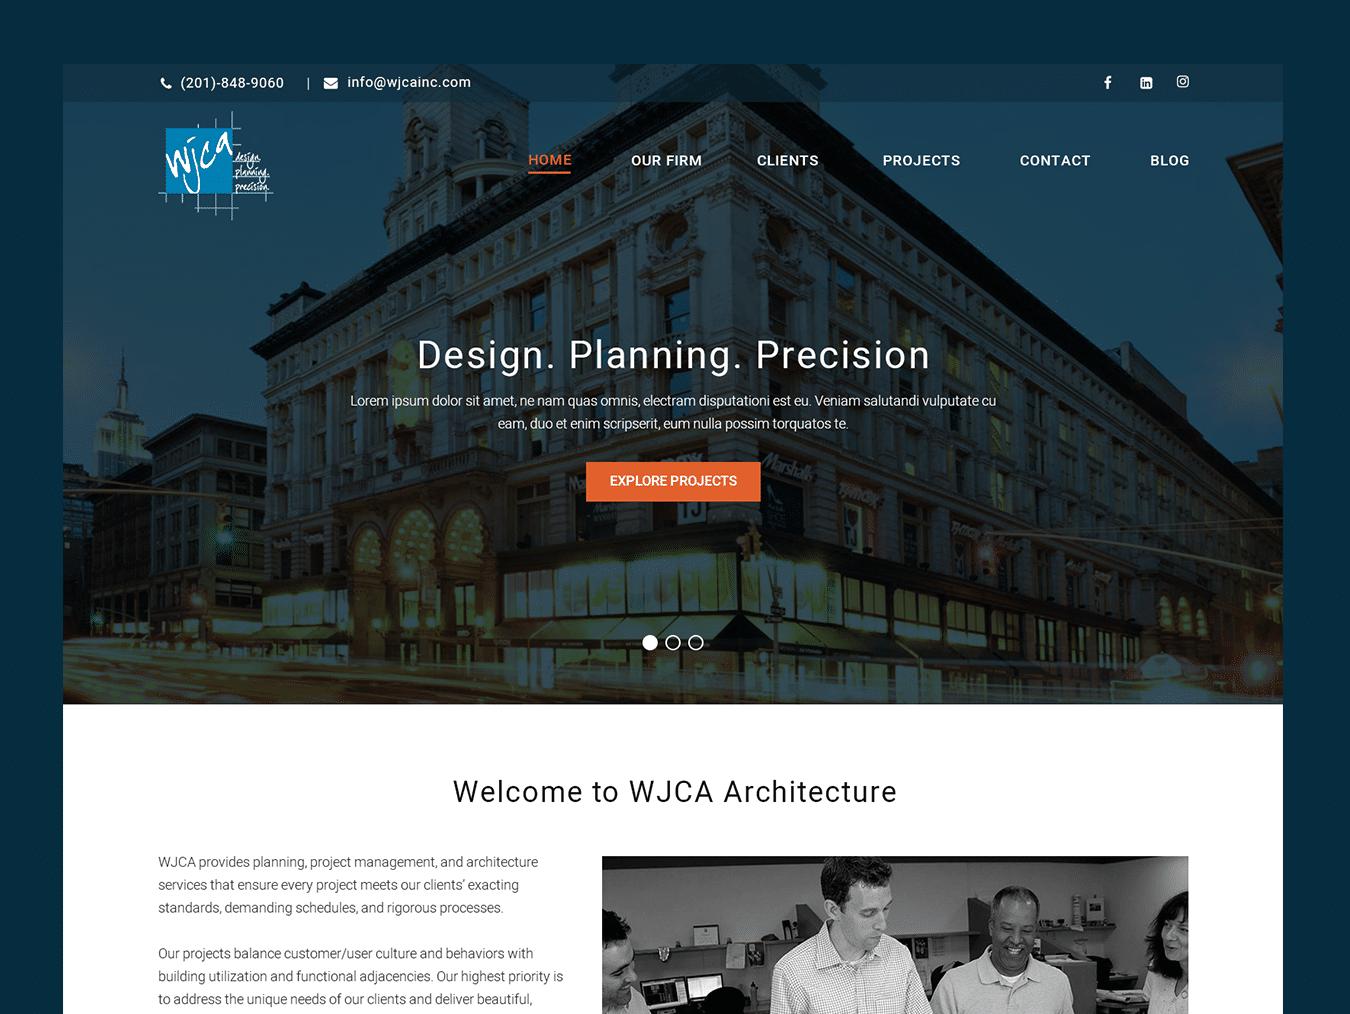 wjca-web-design-featured